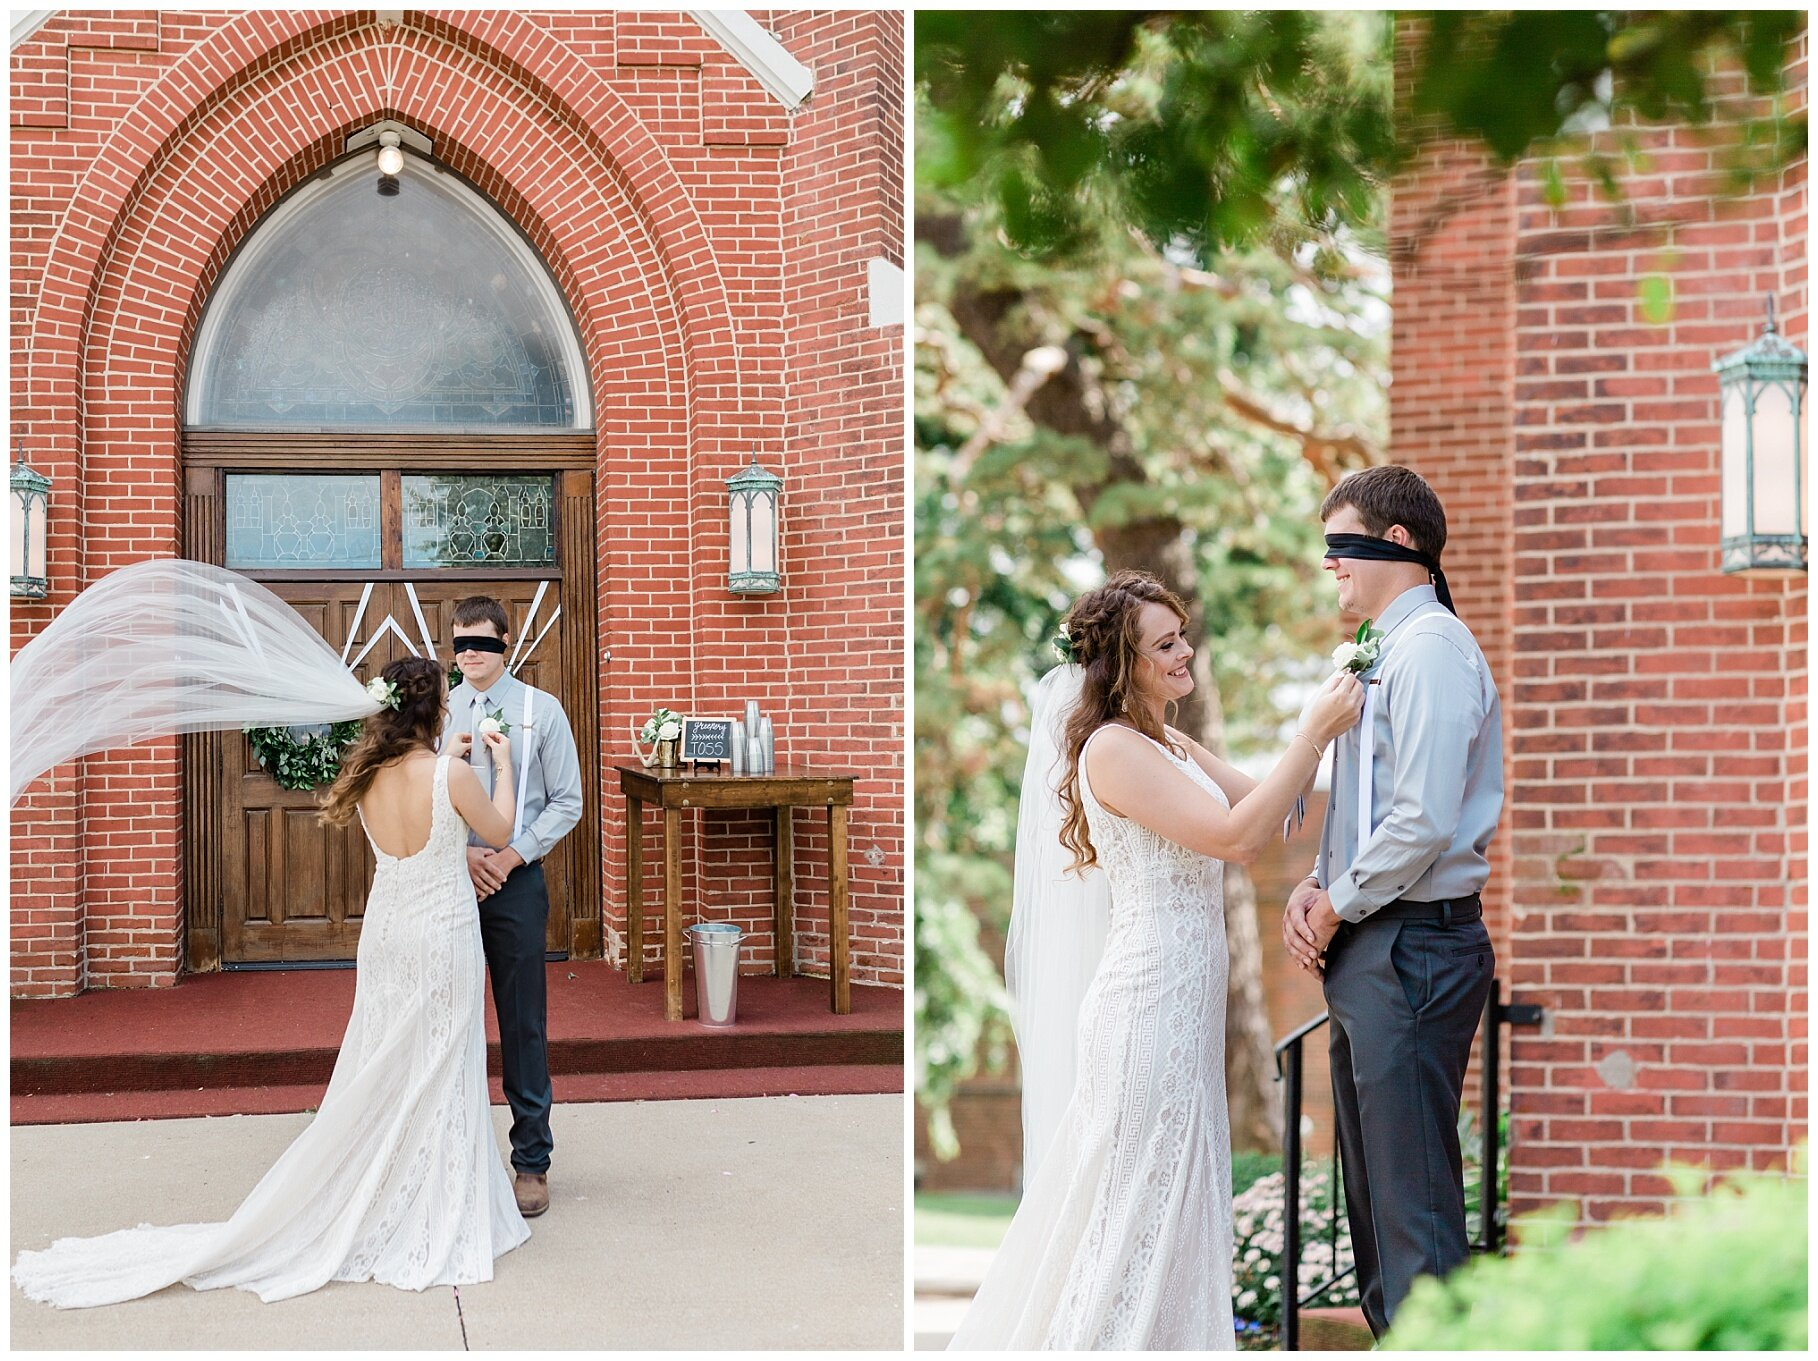 Earth-Toned Wedding by KKP Associate Wedding Photographer and Kelsi Kliethermes Photography Best Columbia Missouri Wedding Photographer_0027.jpg